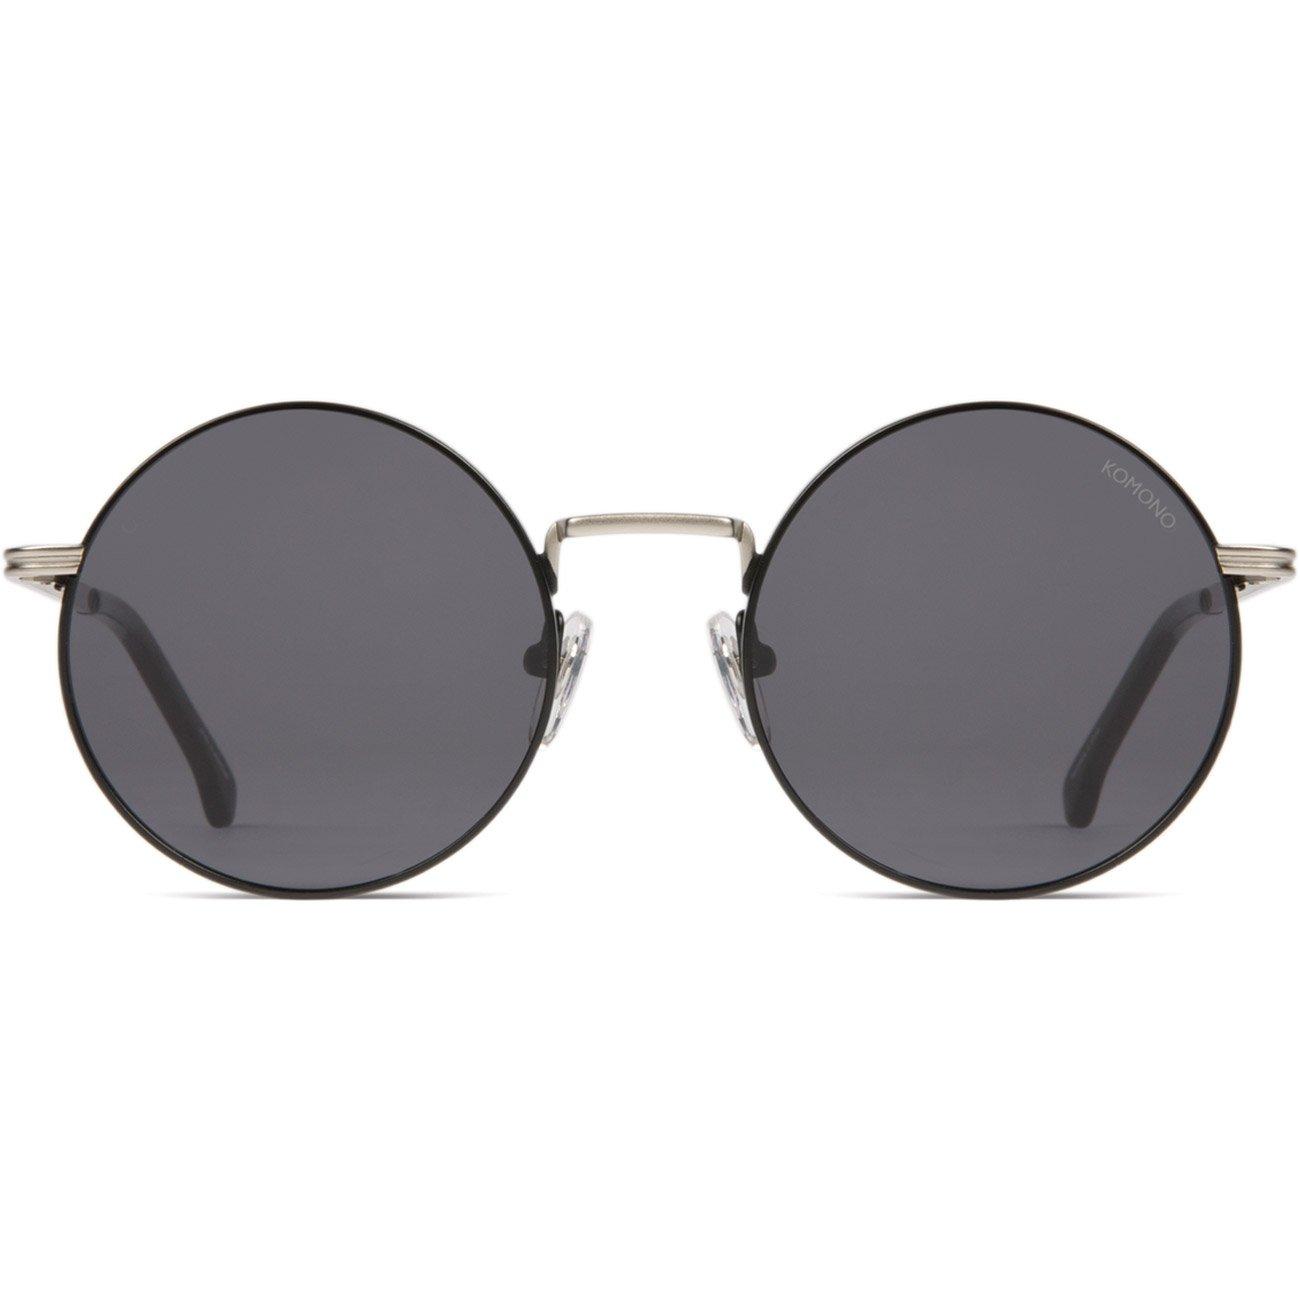 KOMONO Mujer Gafas de Sol Lennon, Plateado y Negro, Talla ...